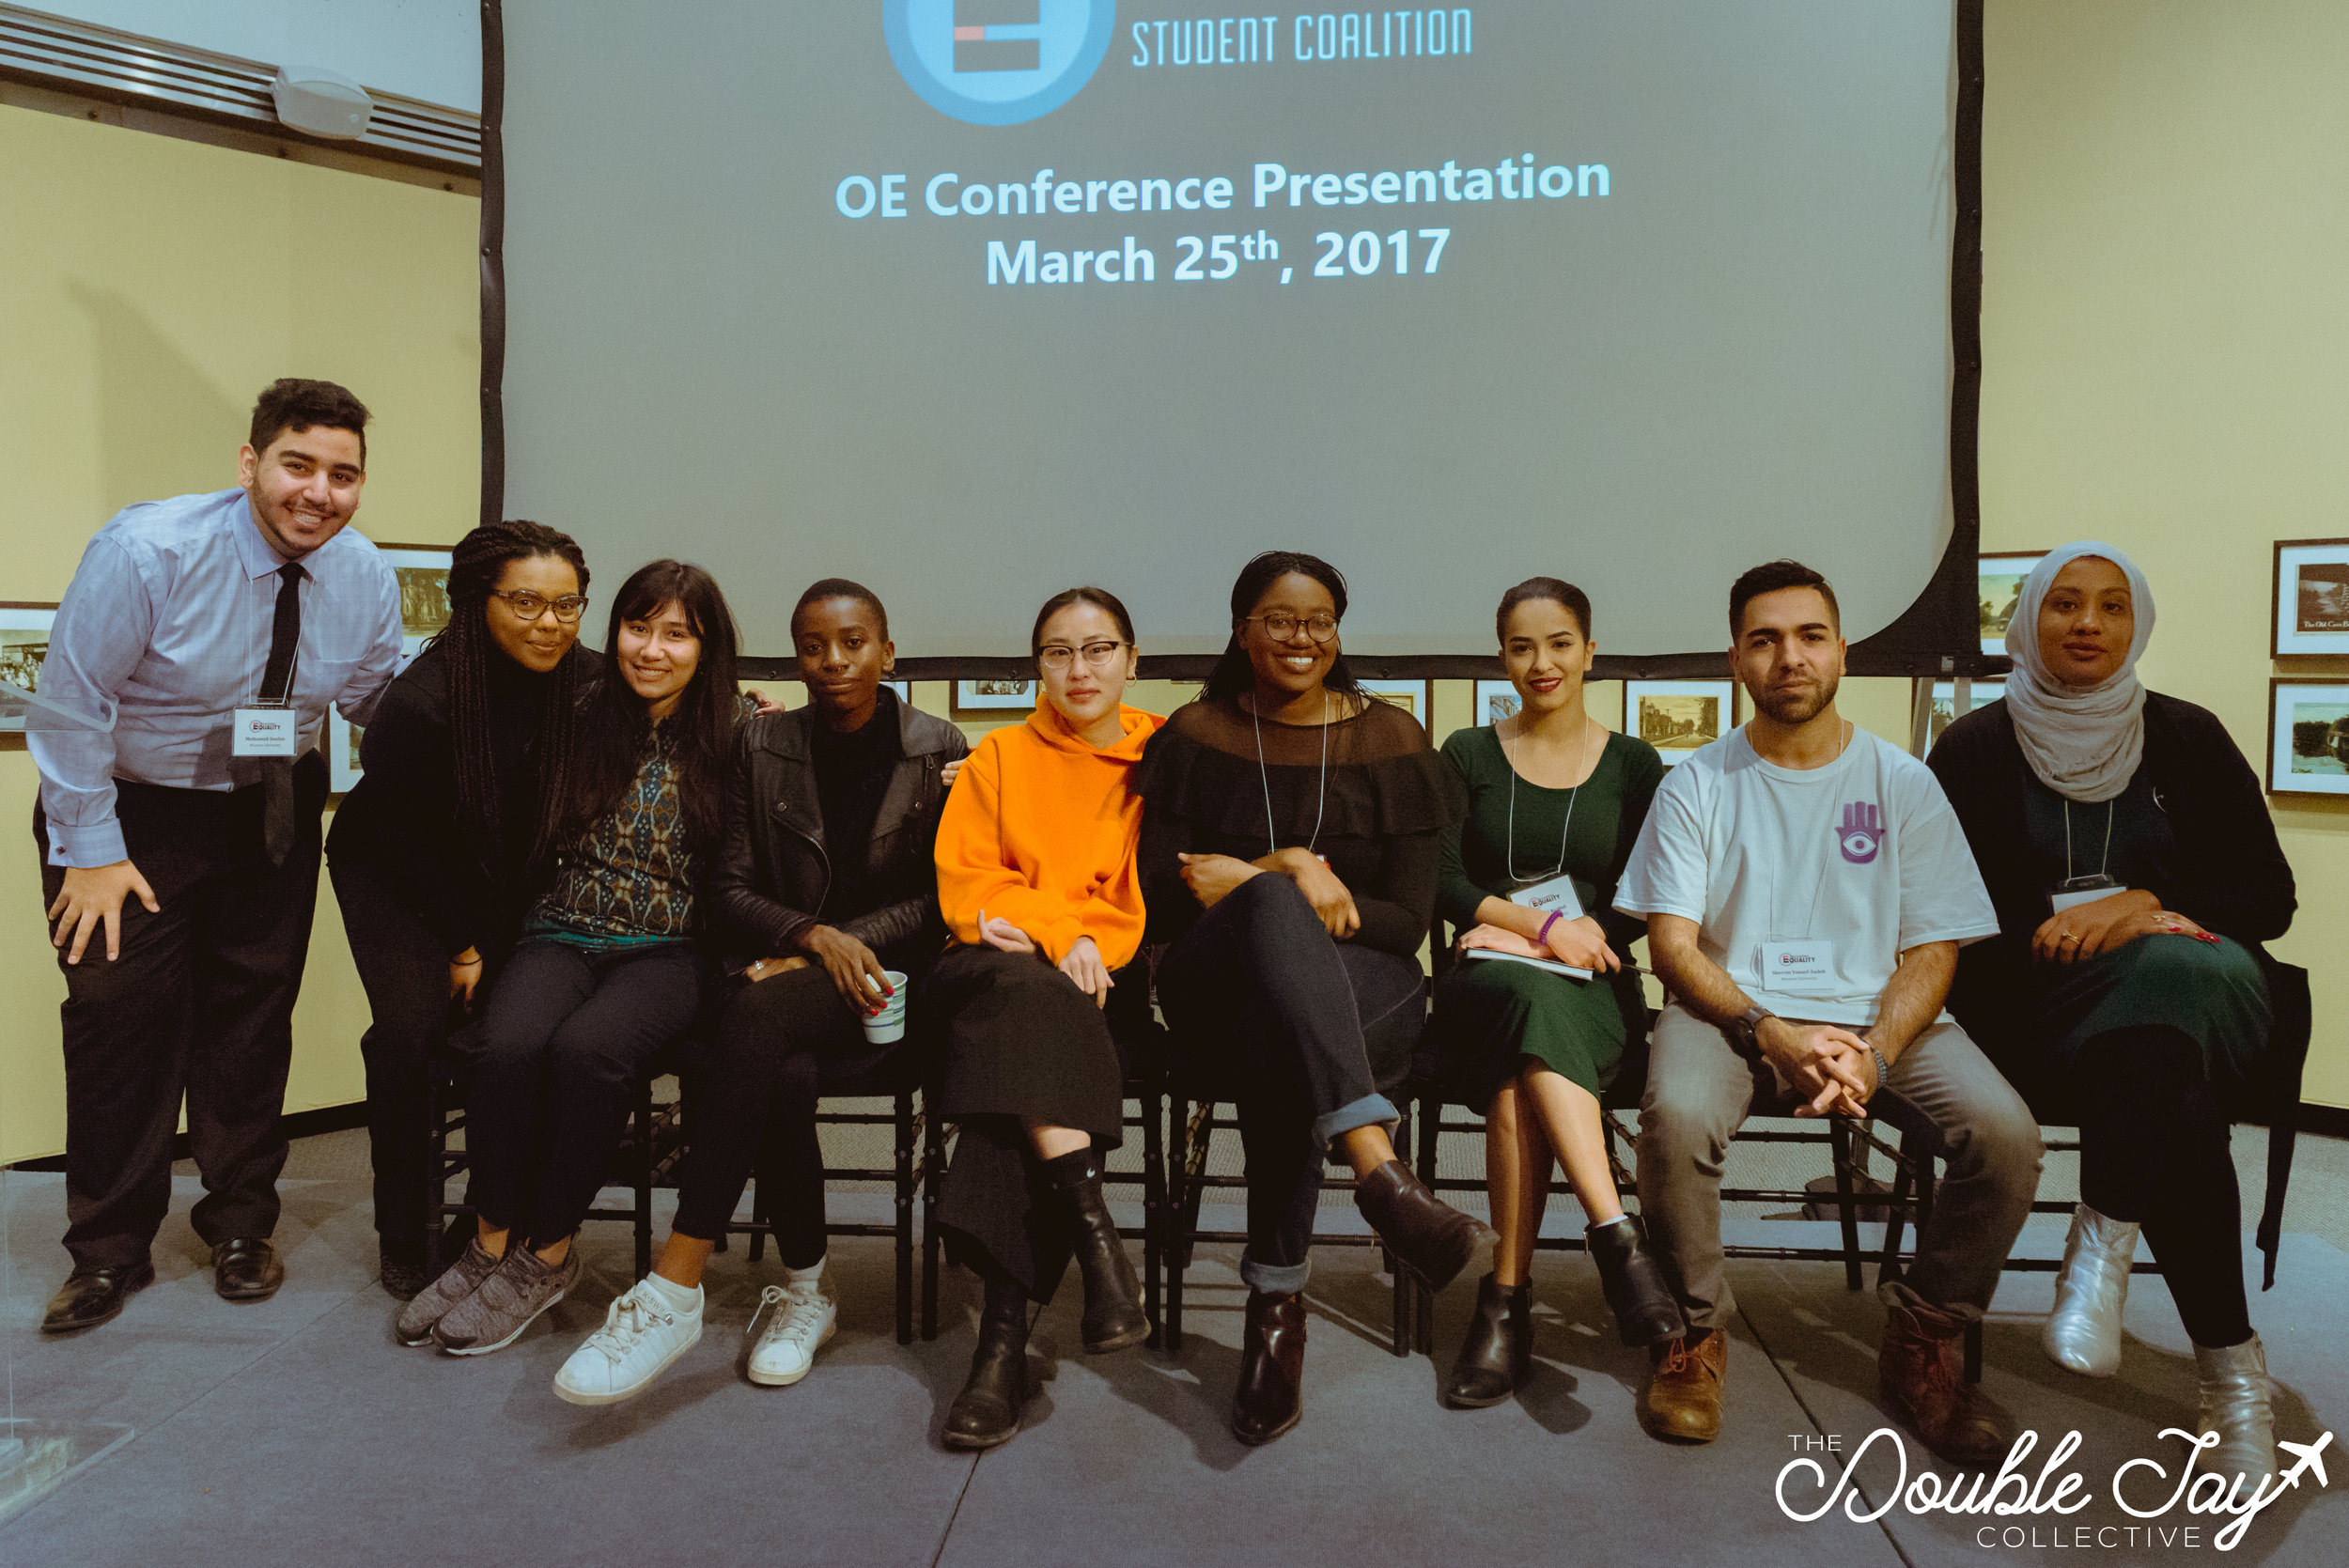 From left to right:Mohammed Soufan, Lily Mehari, Sarah Ghassan, Marie Kamukuny, Nancy Xu, Serwaah Phebih, Shahad Rashid, Shervin Xy, and Rowa Mohamed.